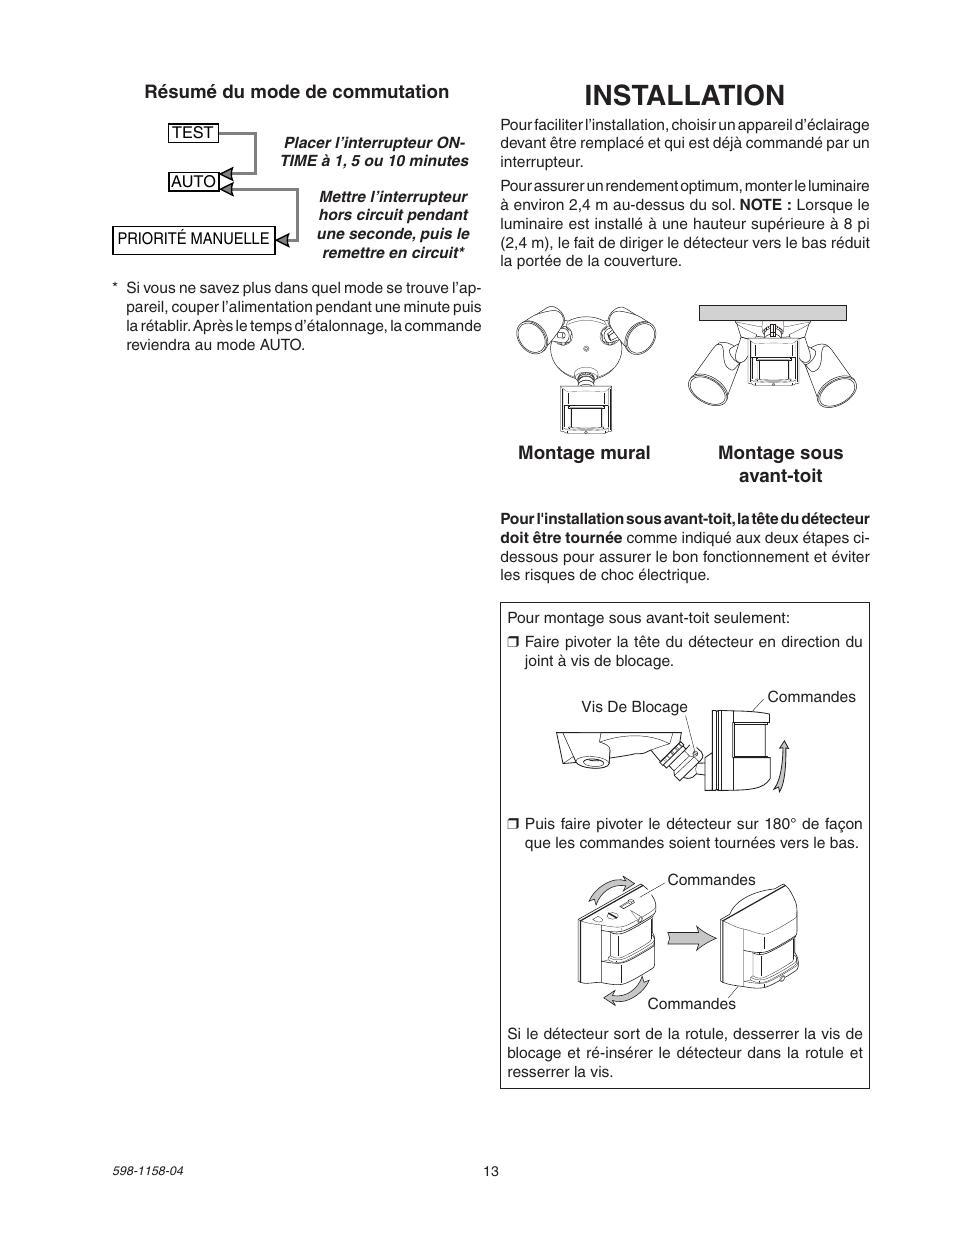 Installation Heath Zenith Motion Sensor Light Control Sh 5412 User